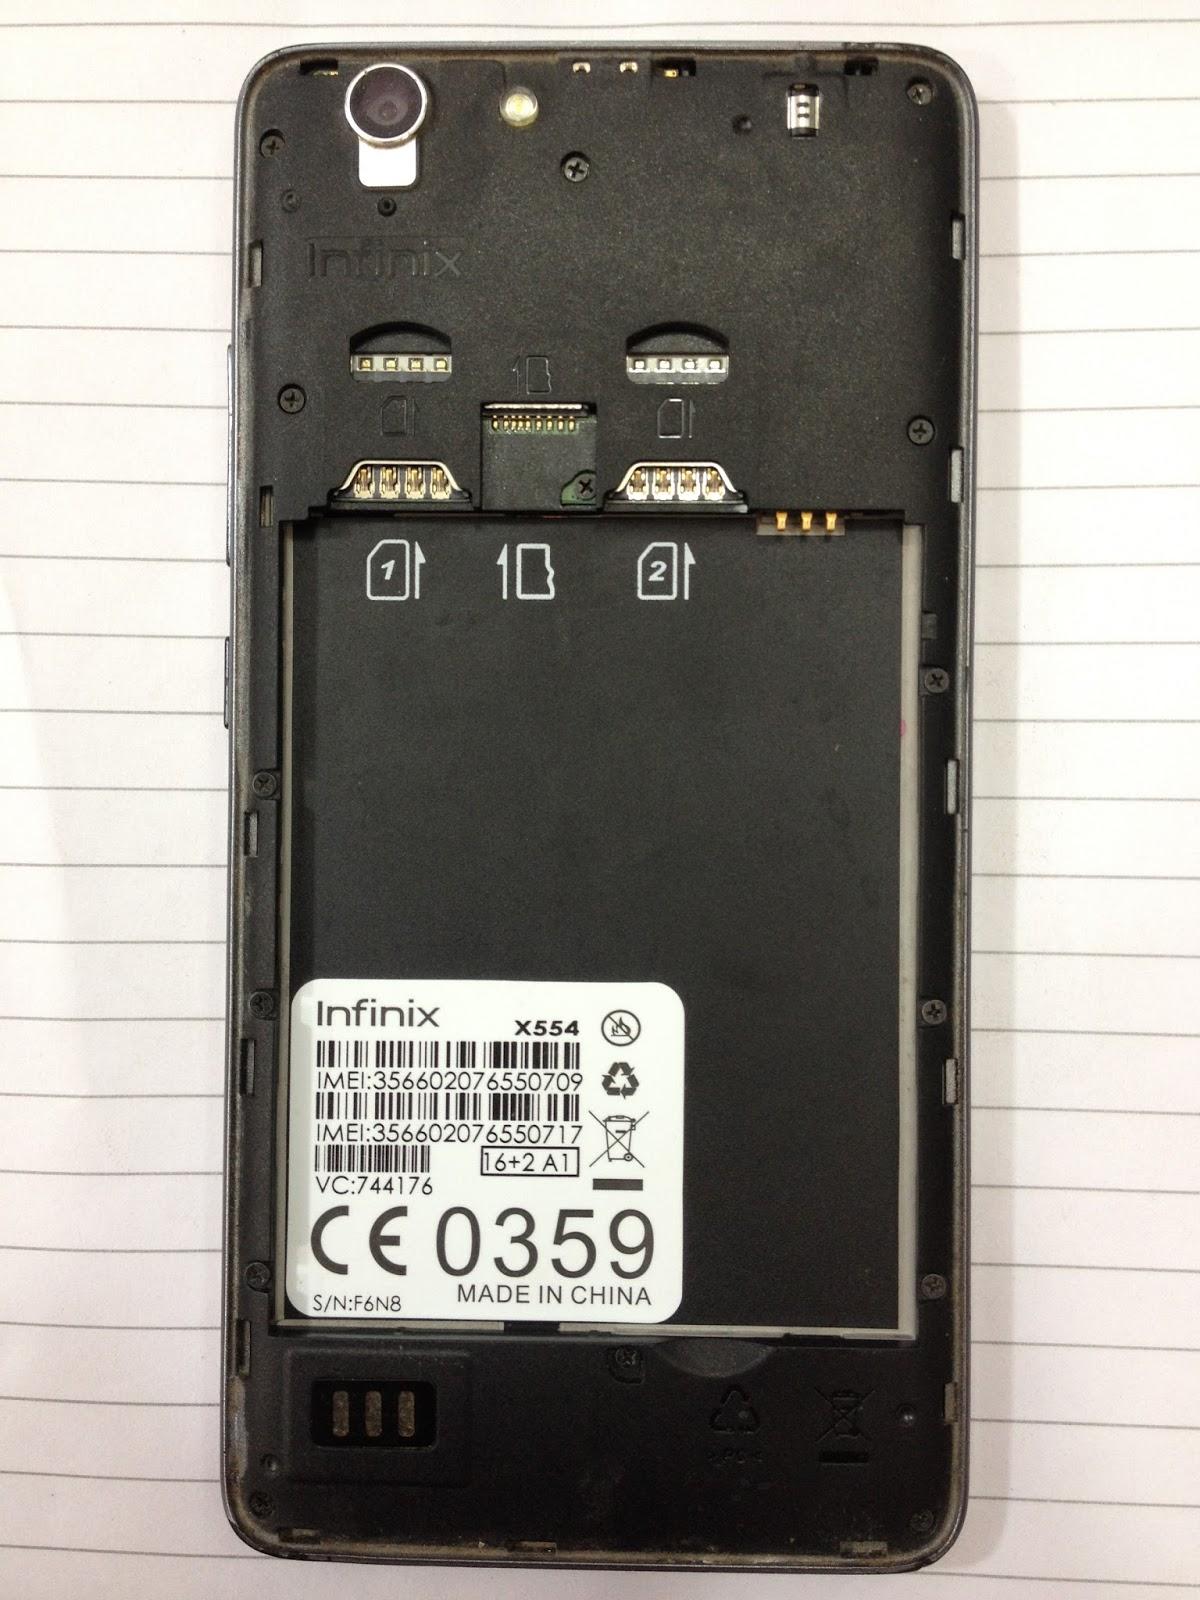 infinix x554 firmware